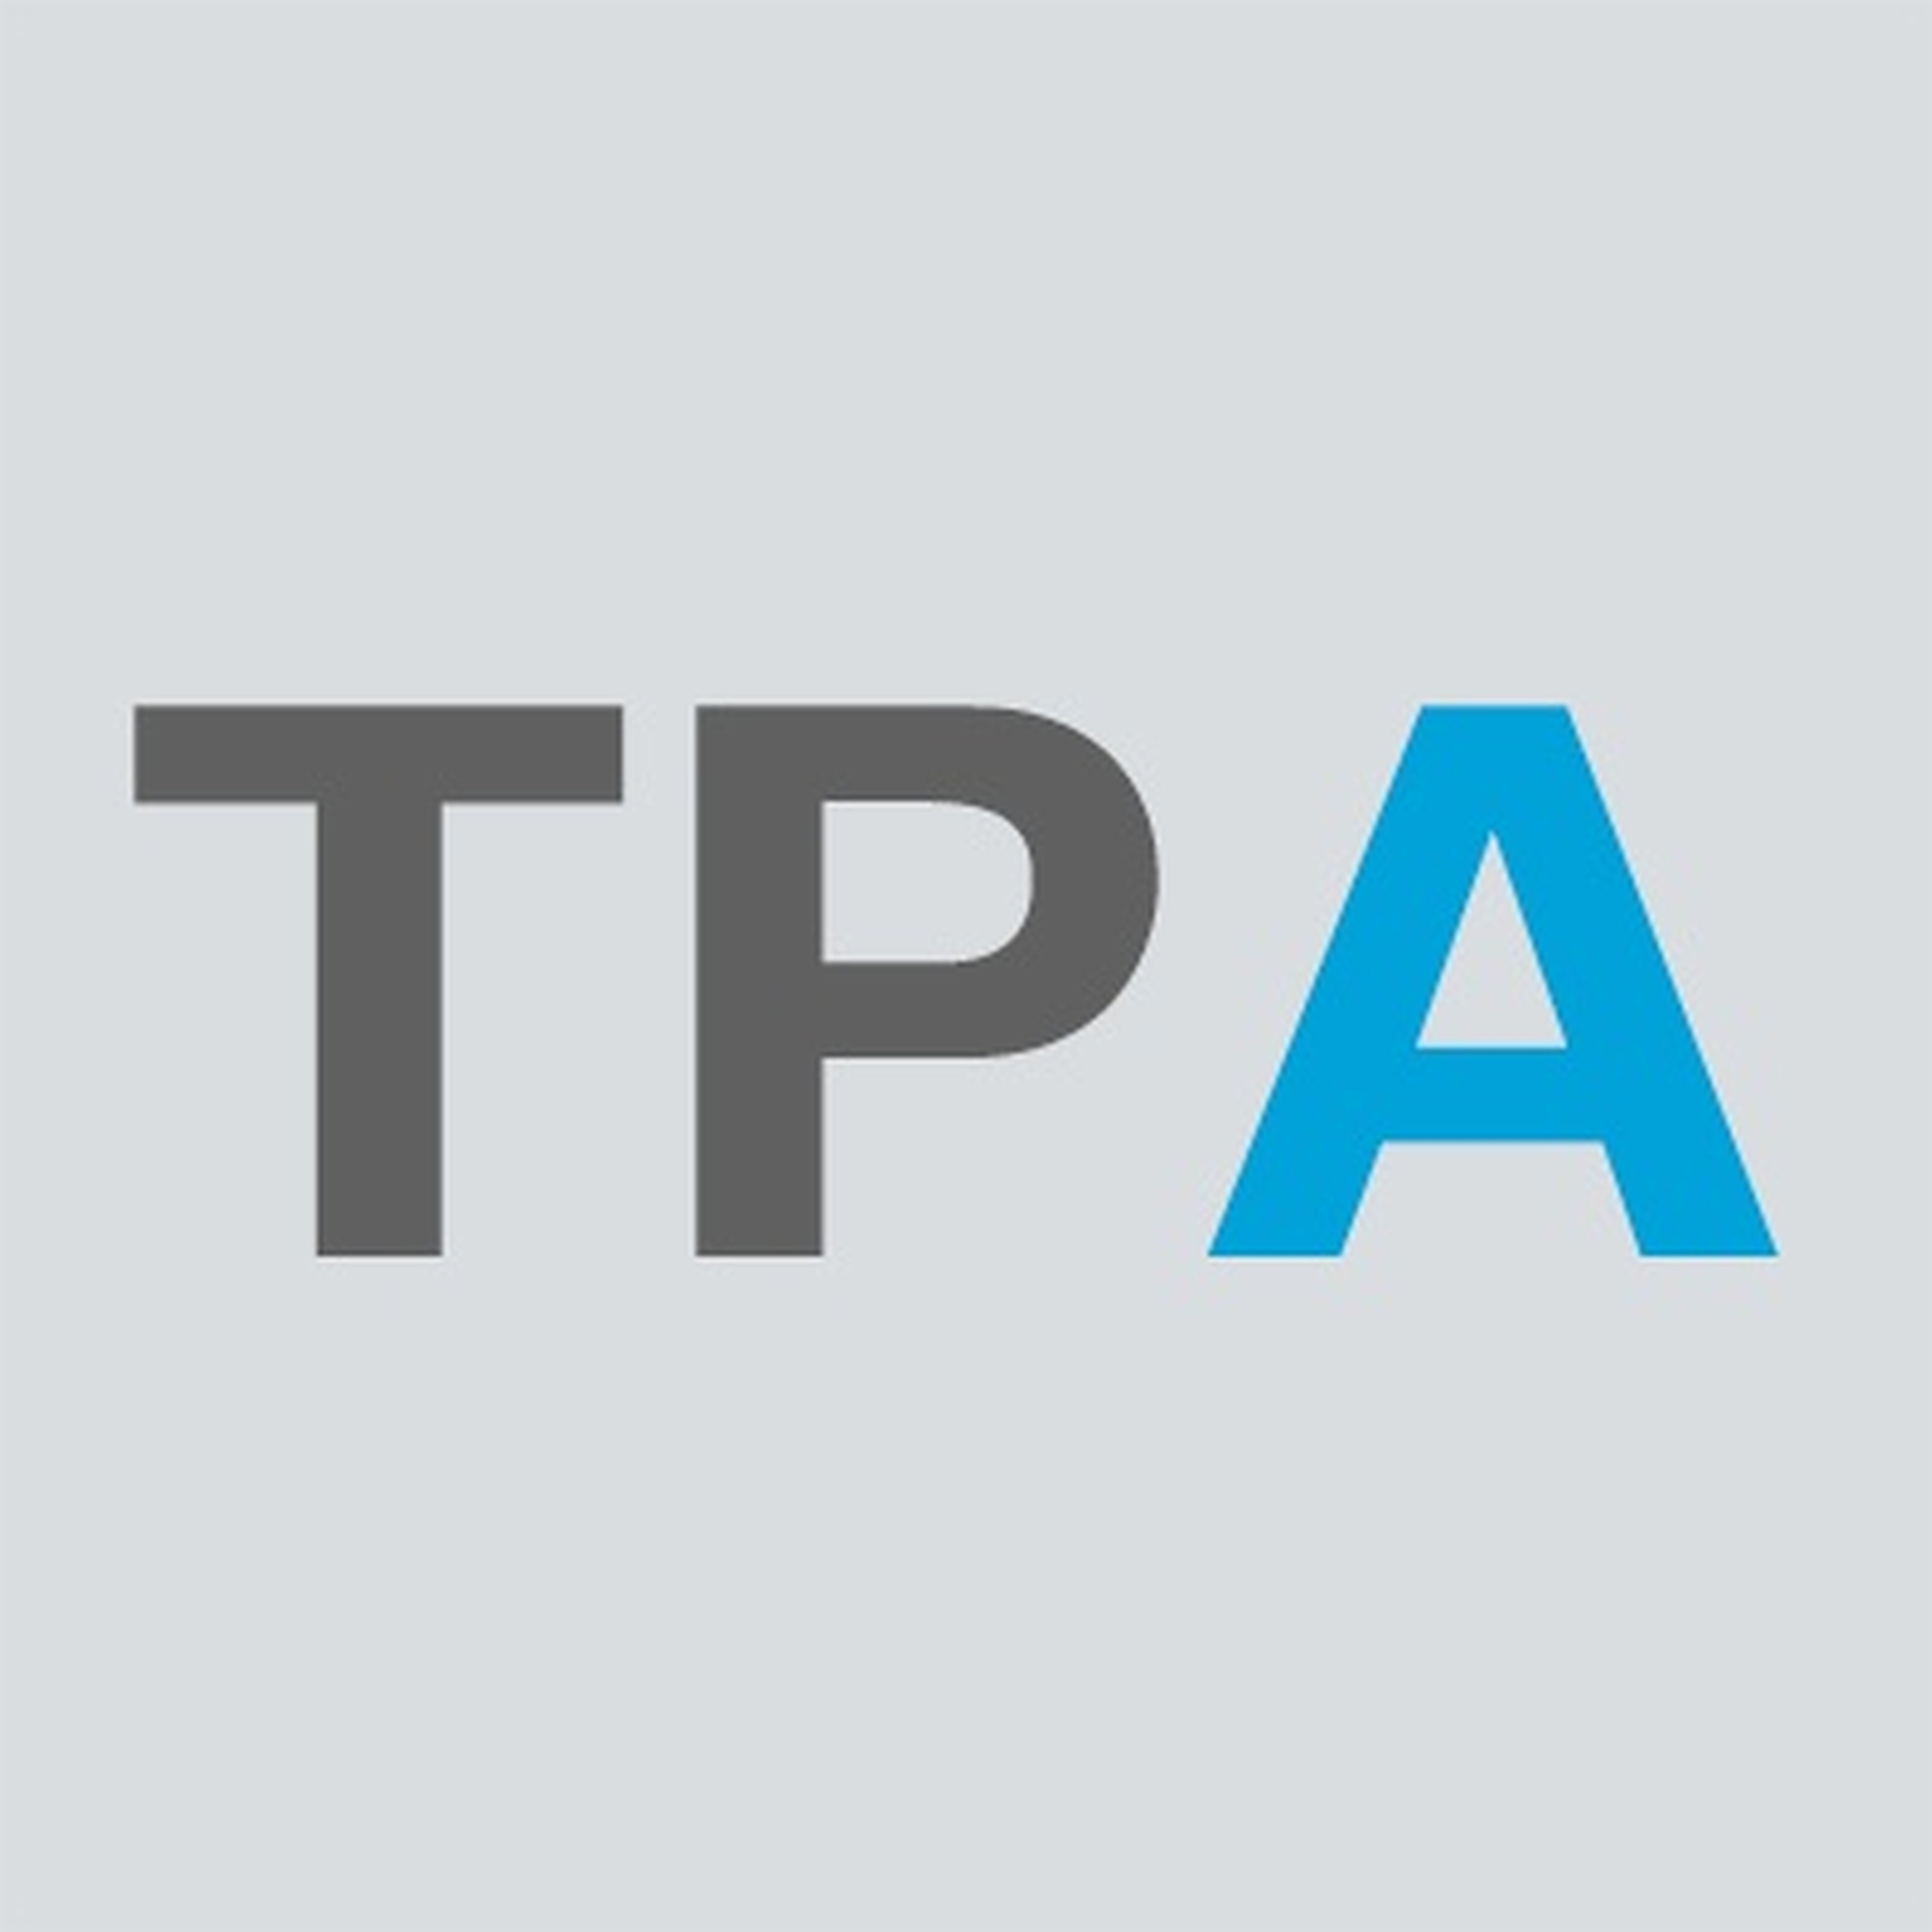 List Of Car Insurance Companies In Dallas Tx